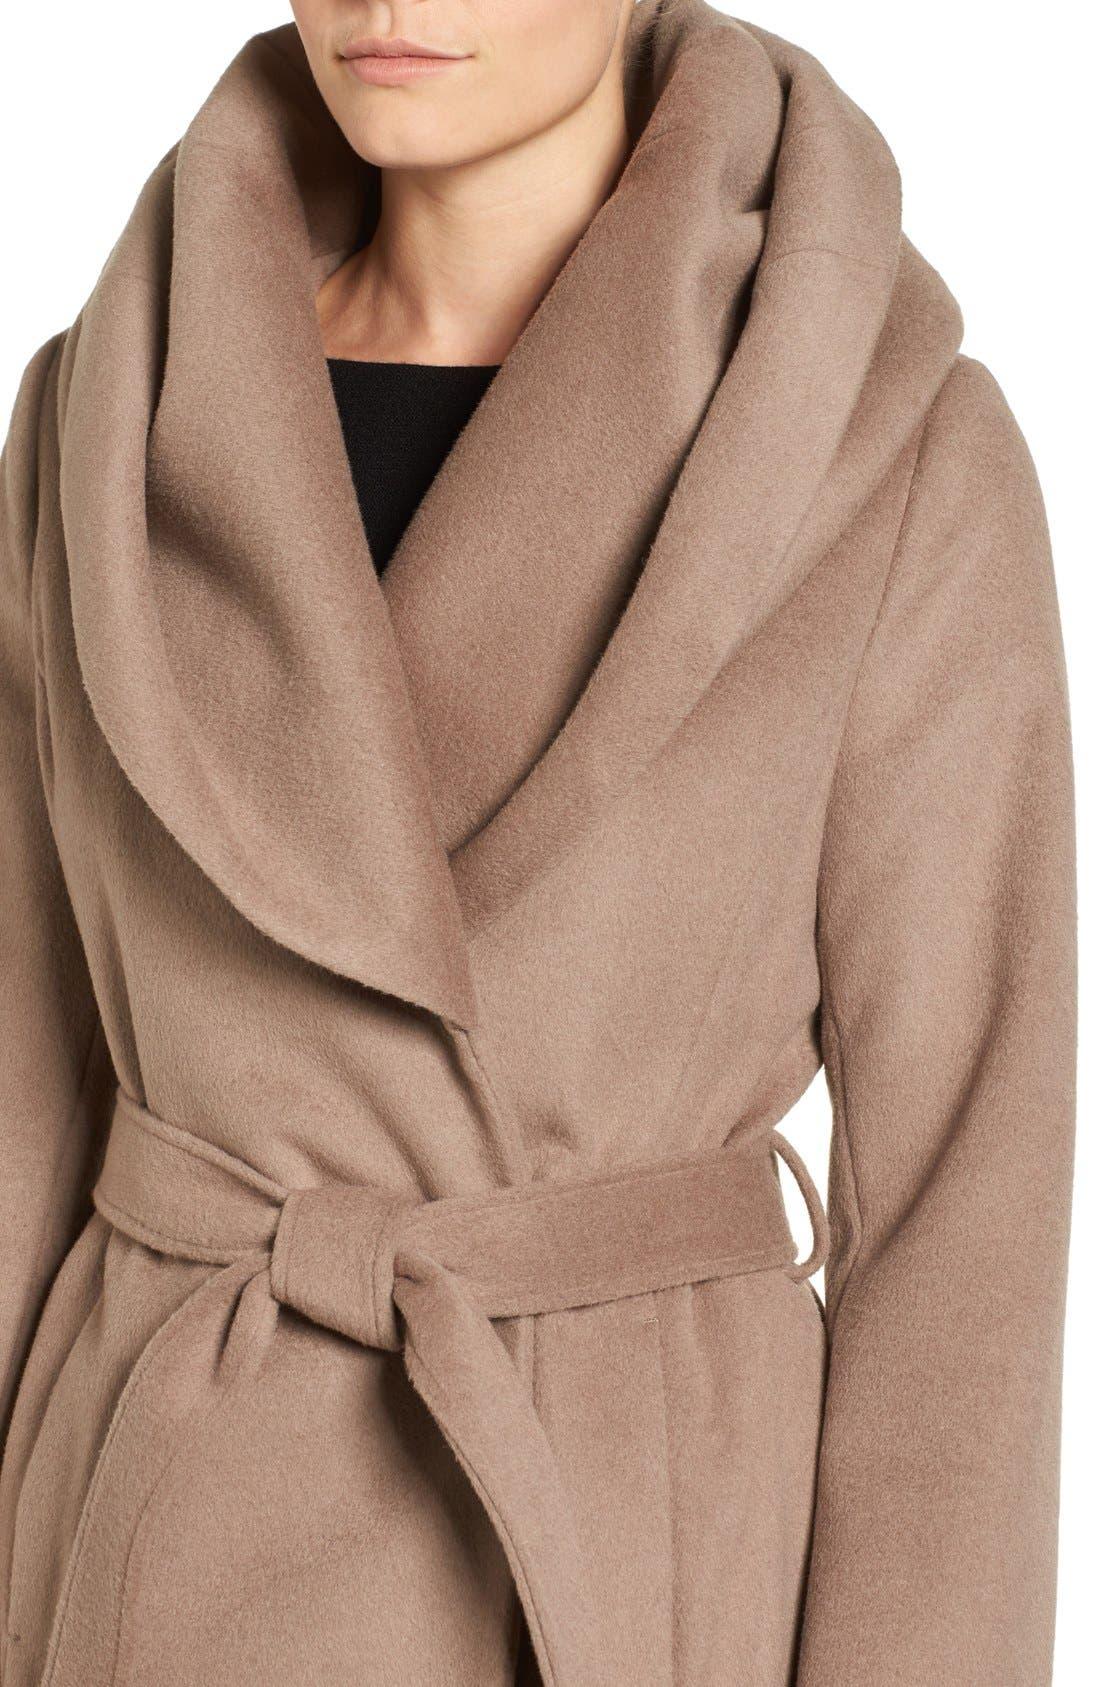 T Tahari Wool Blend Belted Wrap Coat,                             Alternate thumbnail 24, color,